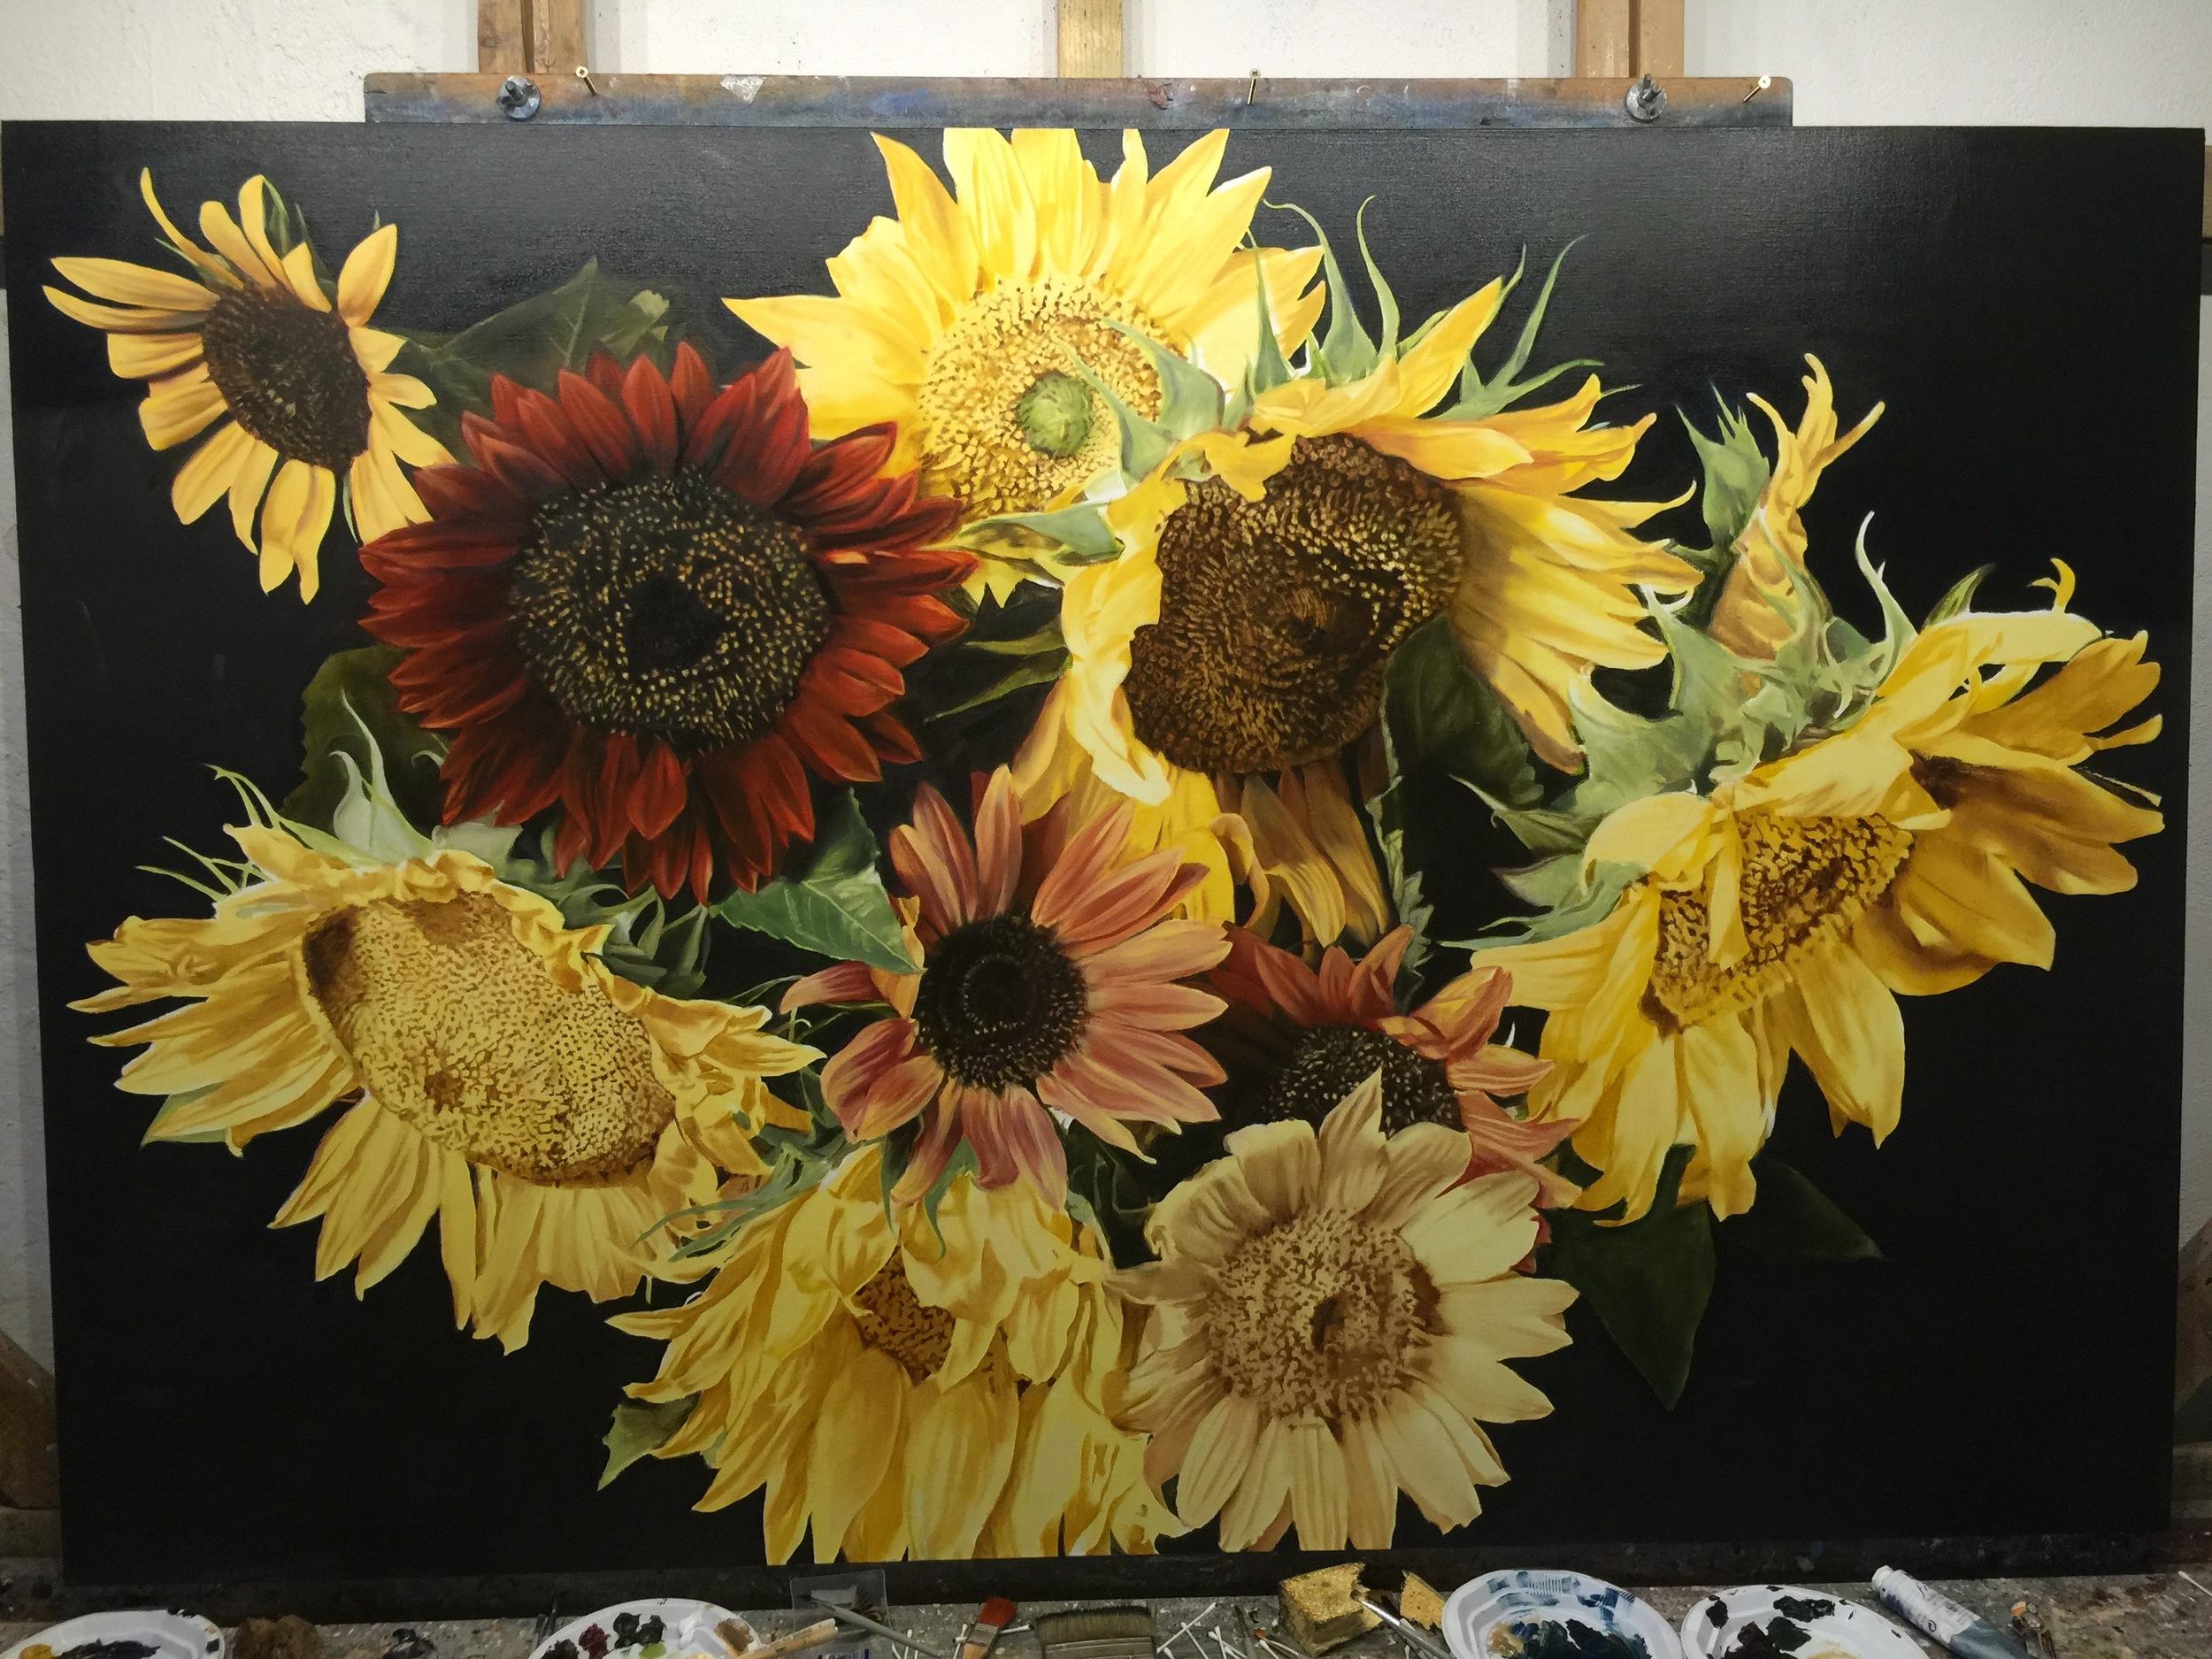 Thomas-Darnell-Painting-Beauty-jessewaugh.com-20.jpg